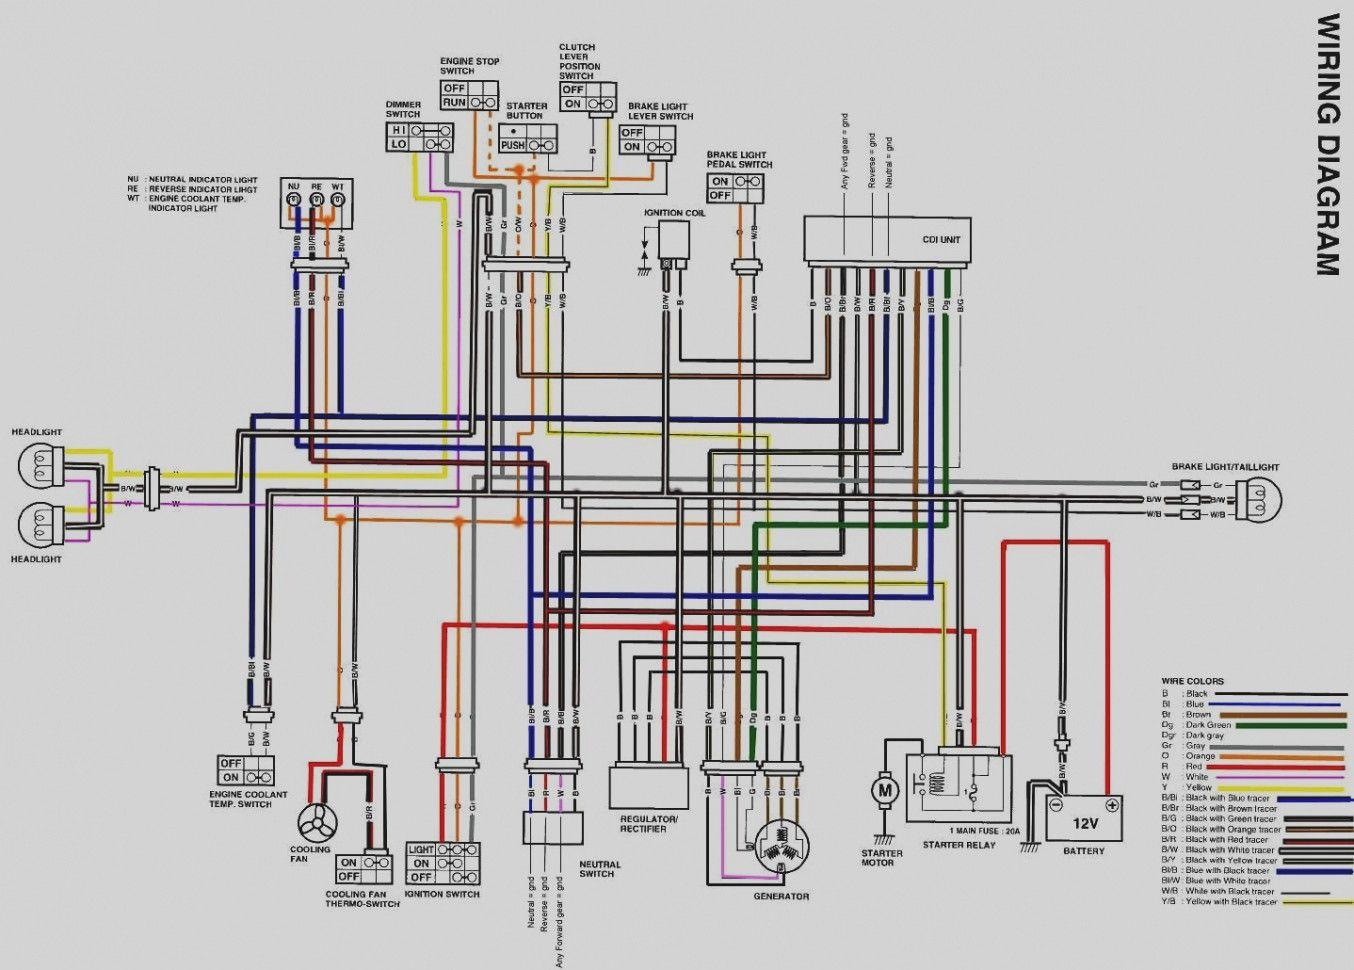 Yfz 450 Lights Awesome Electrical Wiring Diagram Yamaha Diagram